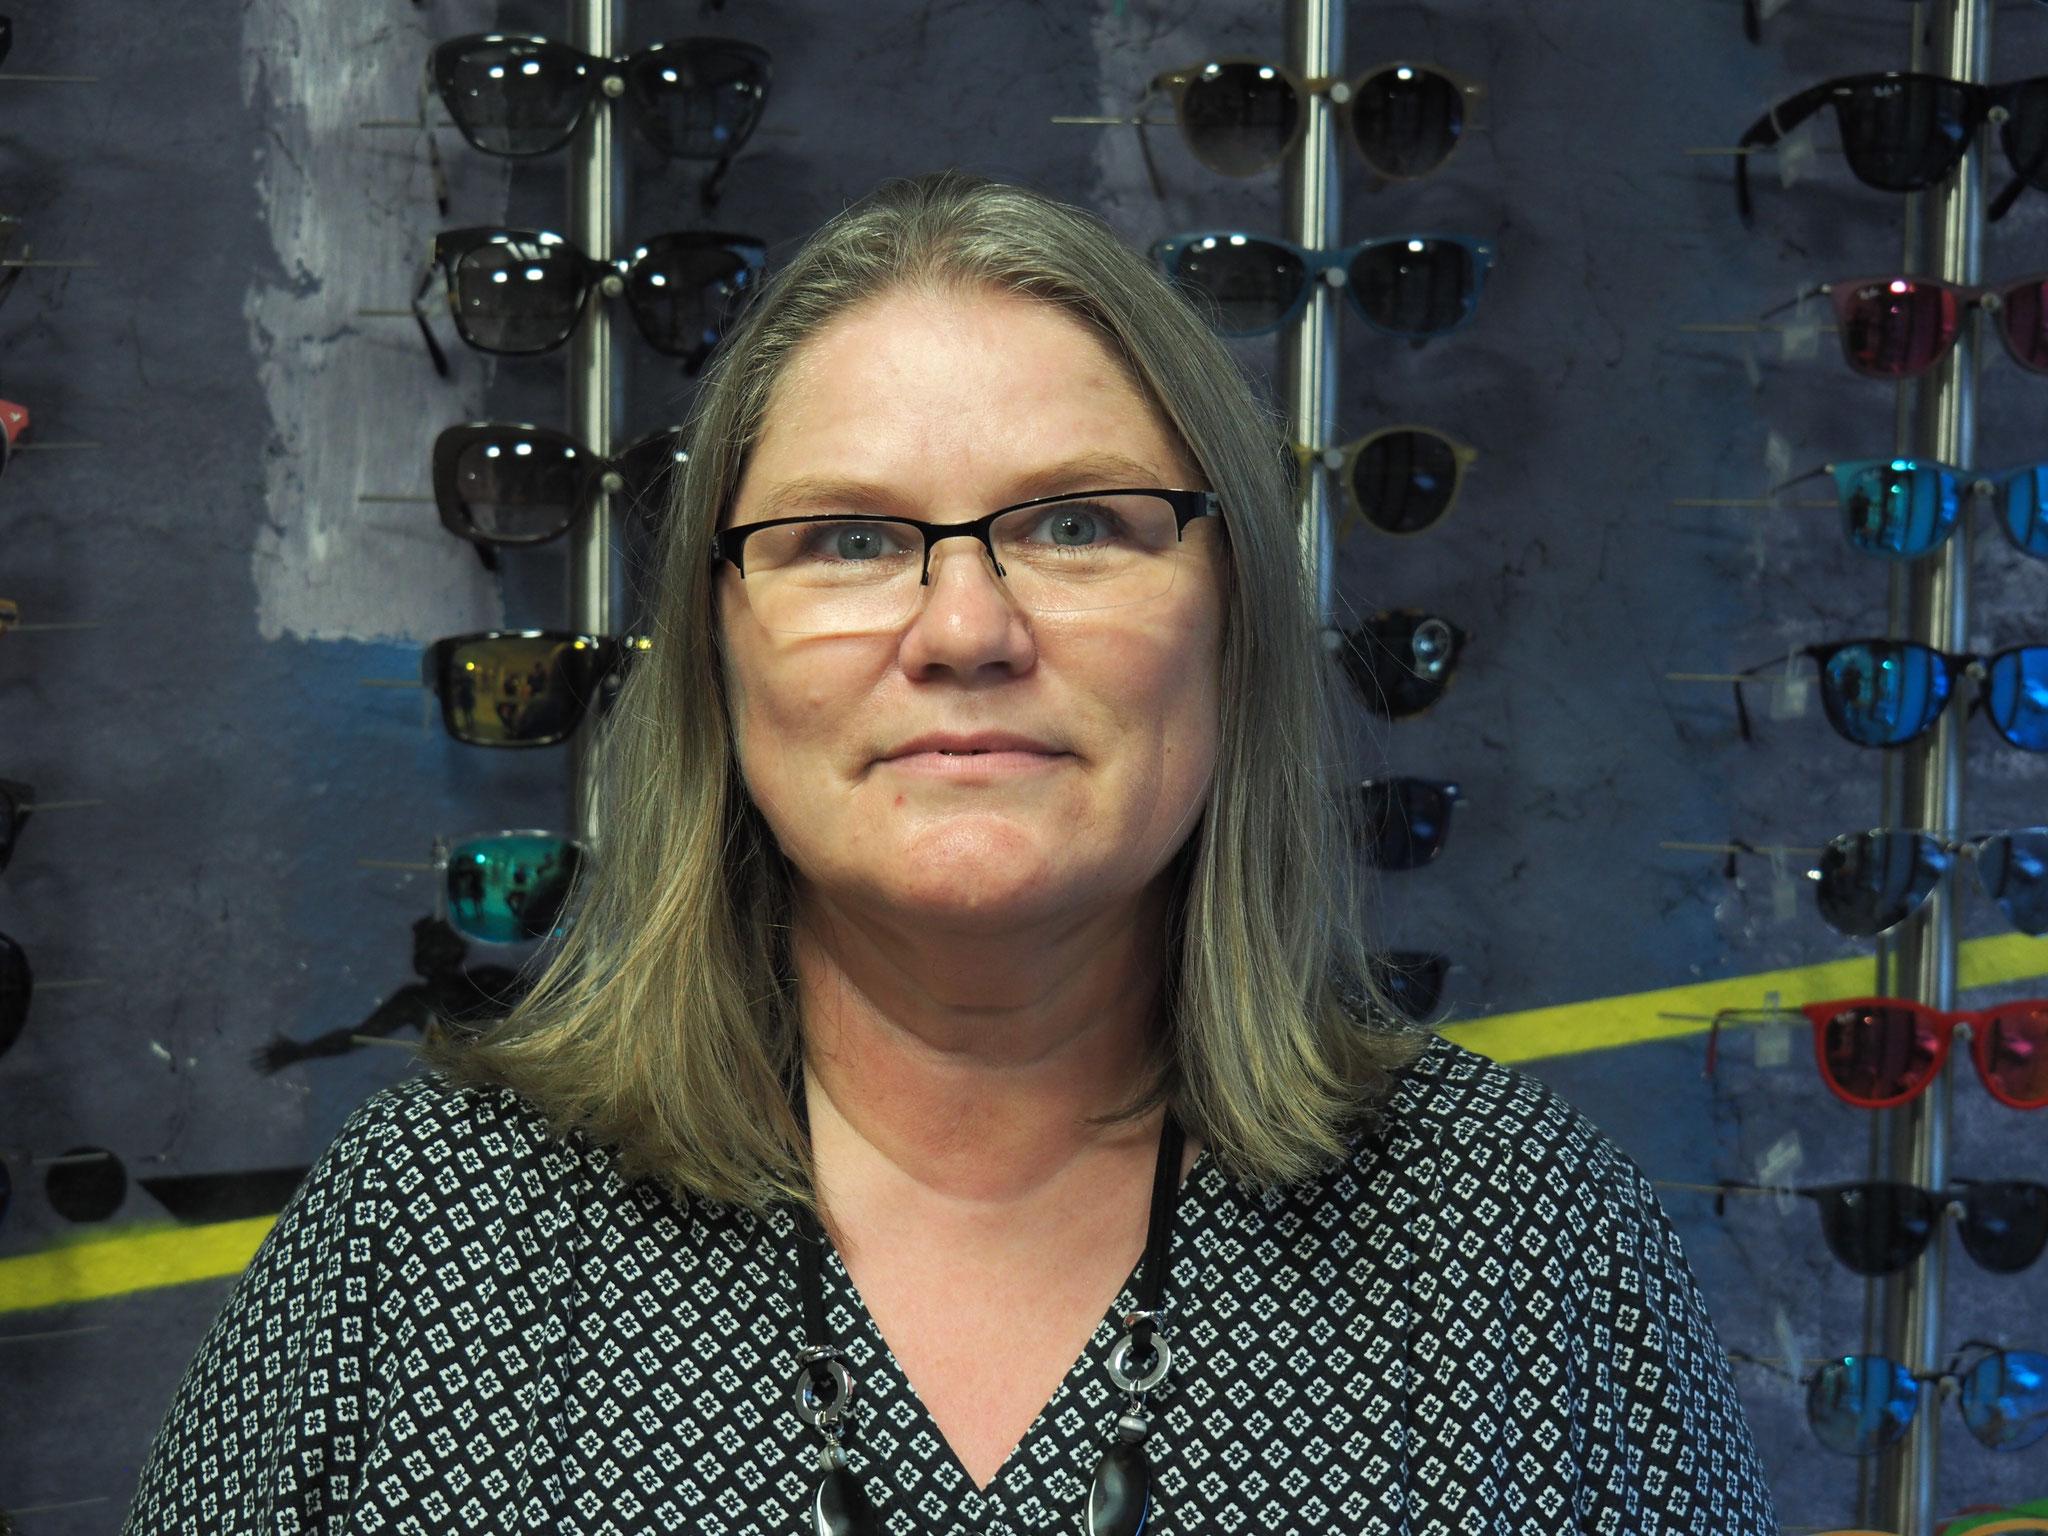 Unsere Optikerassistentin